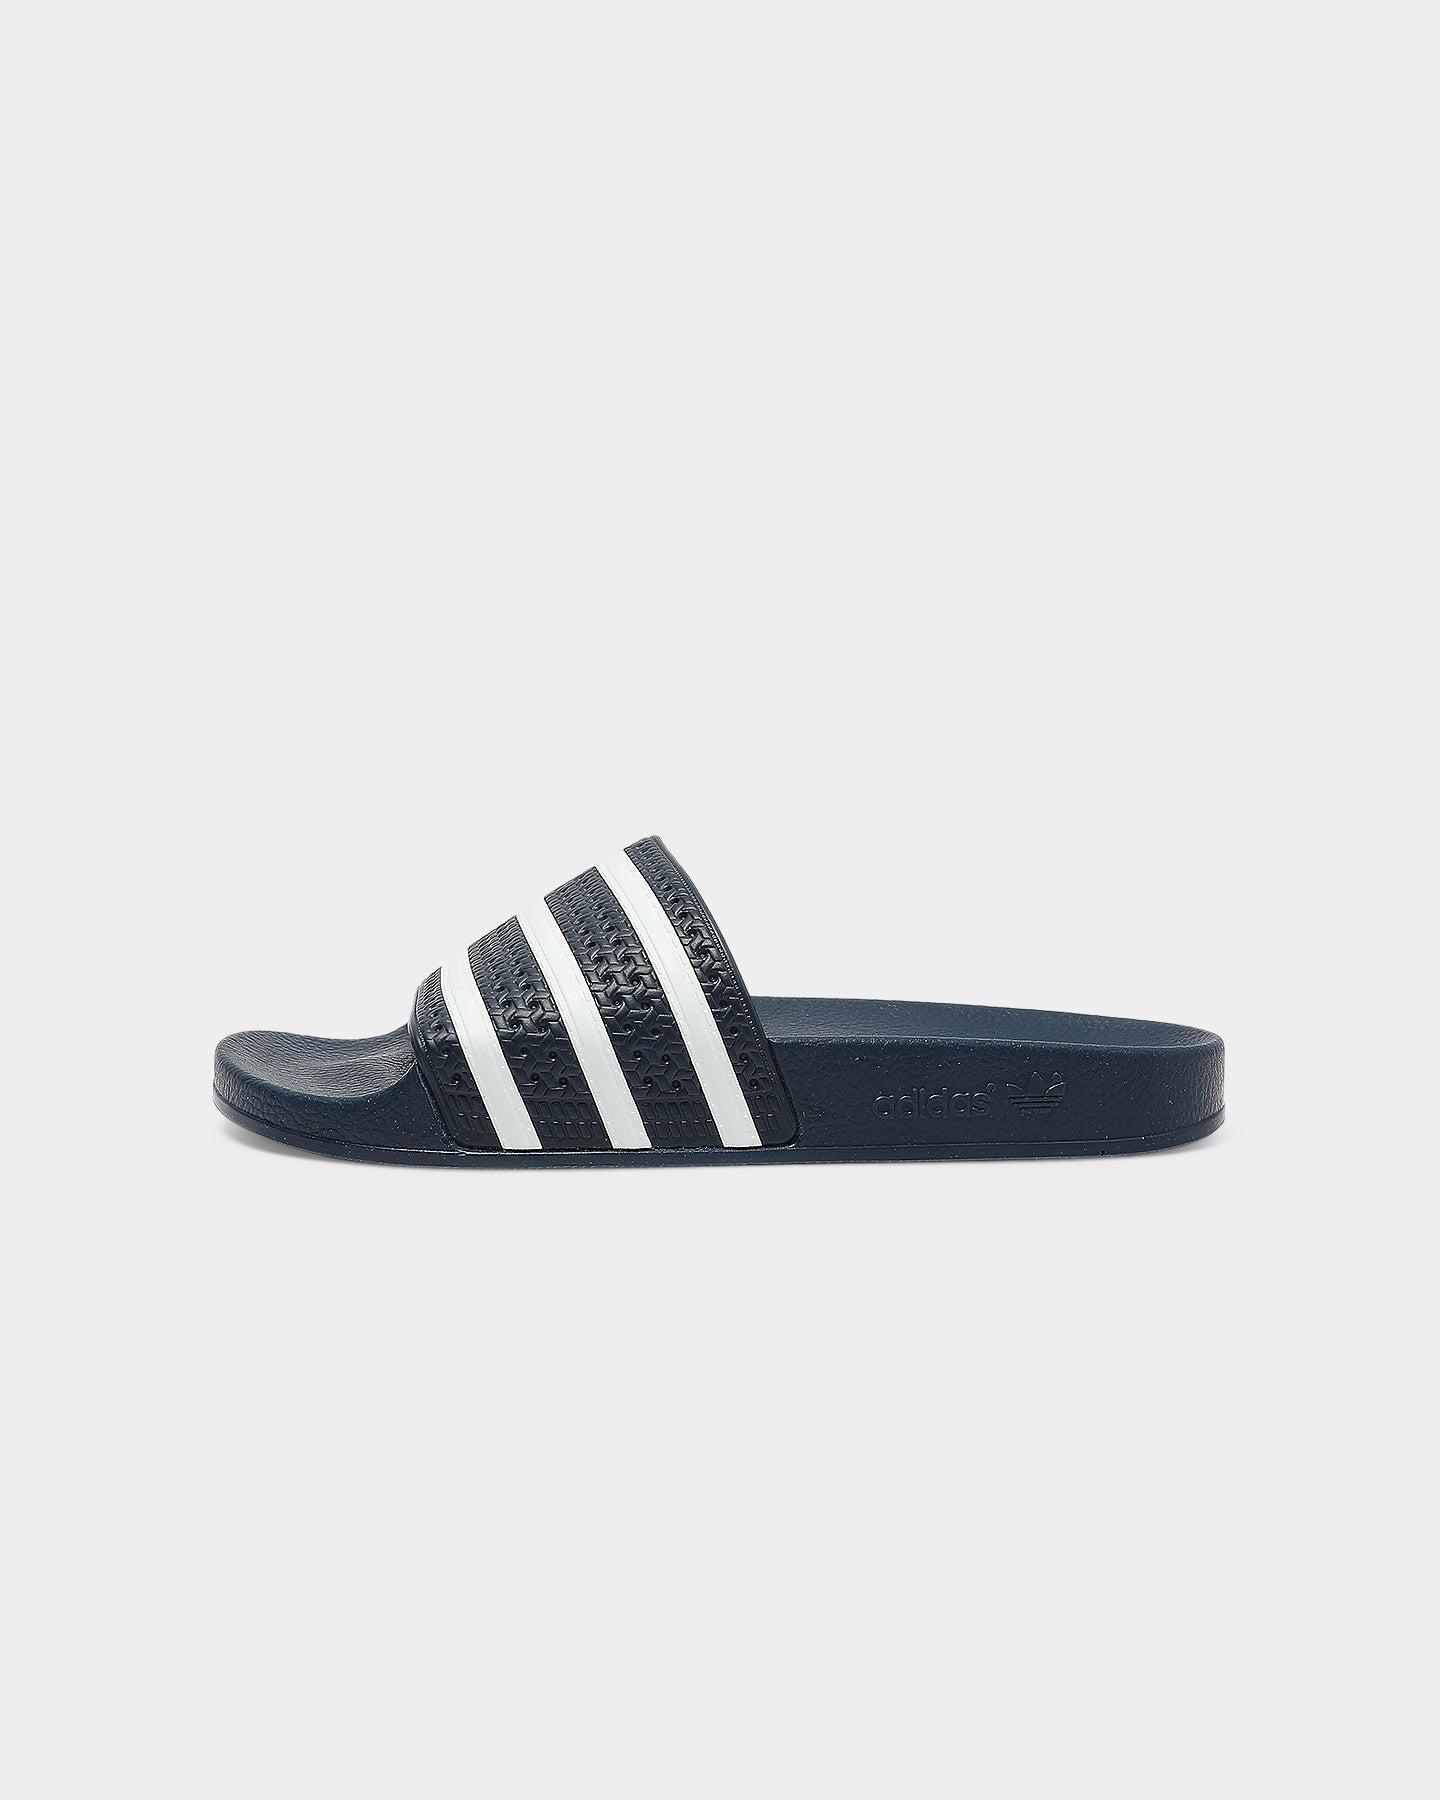 adidas slides navy and white